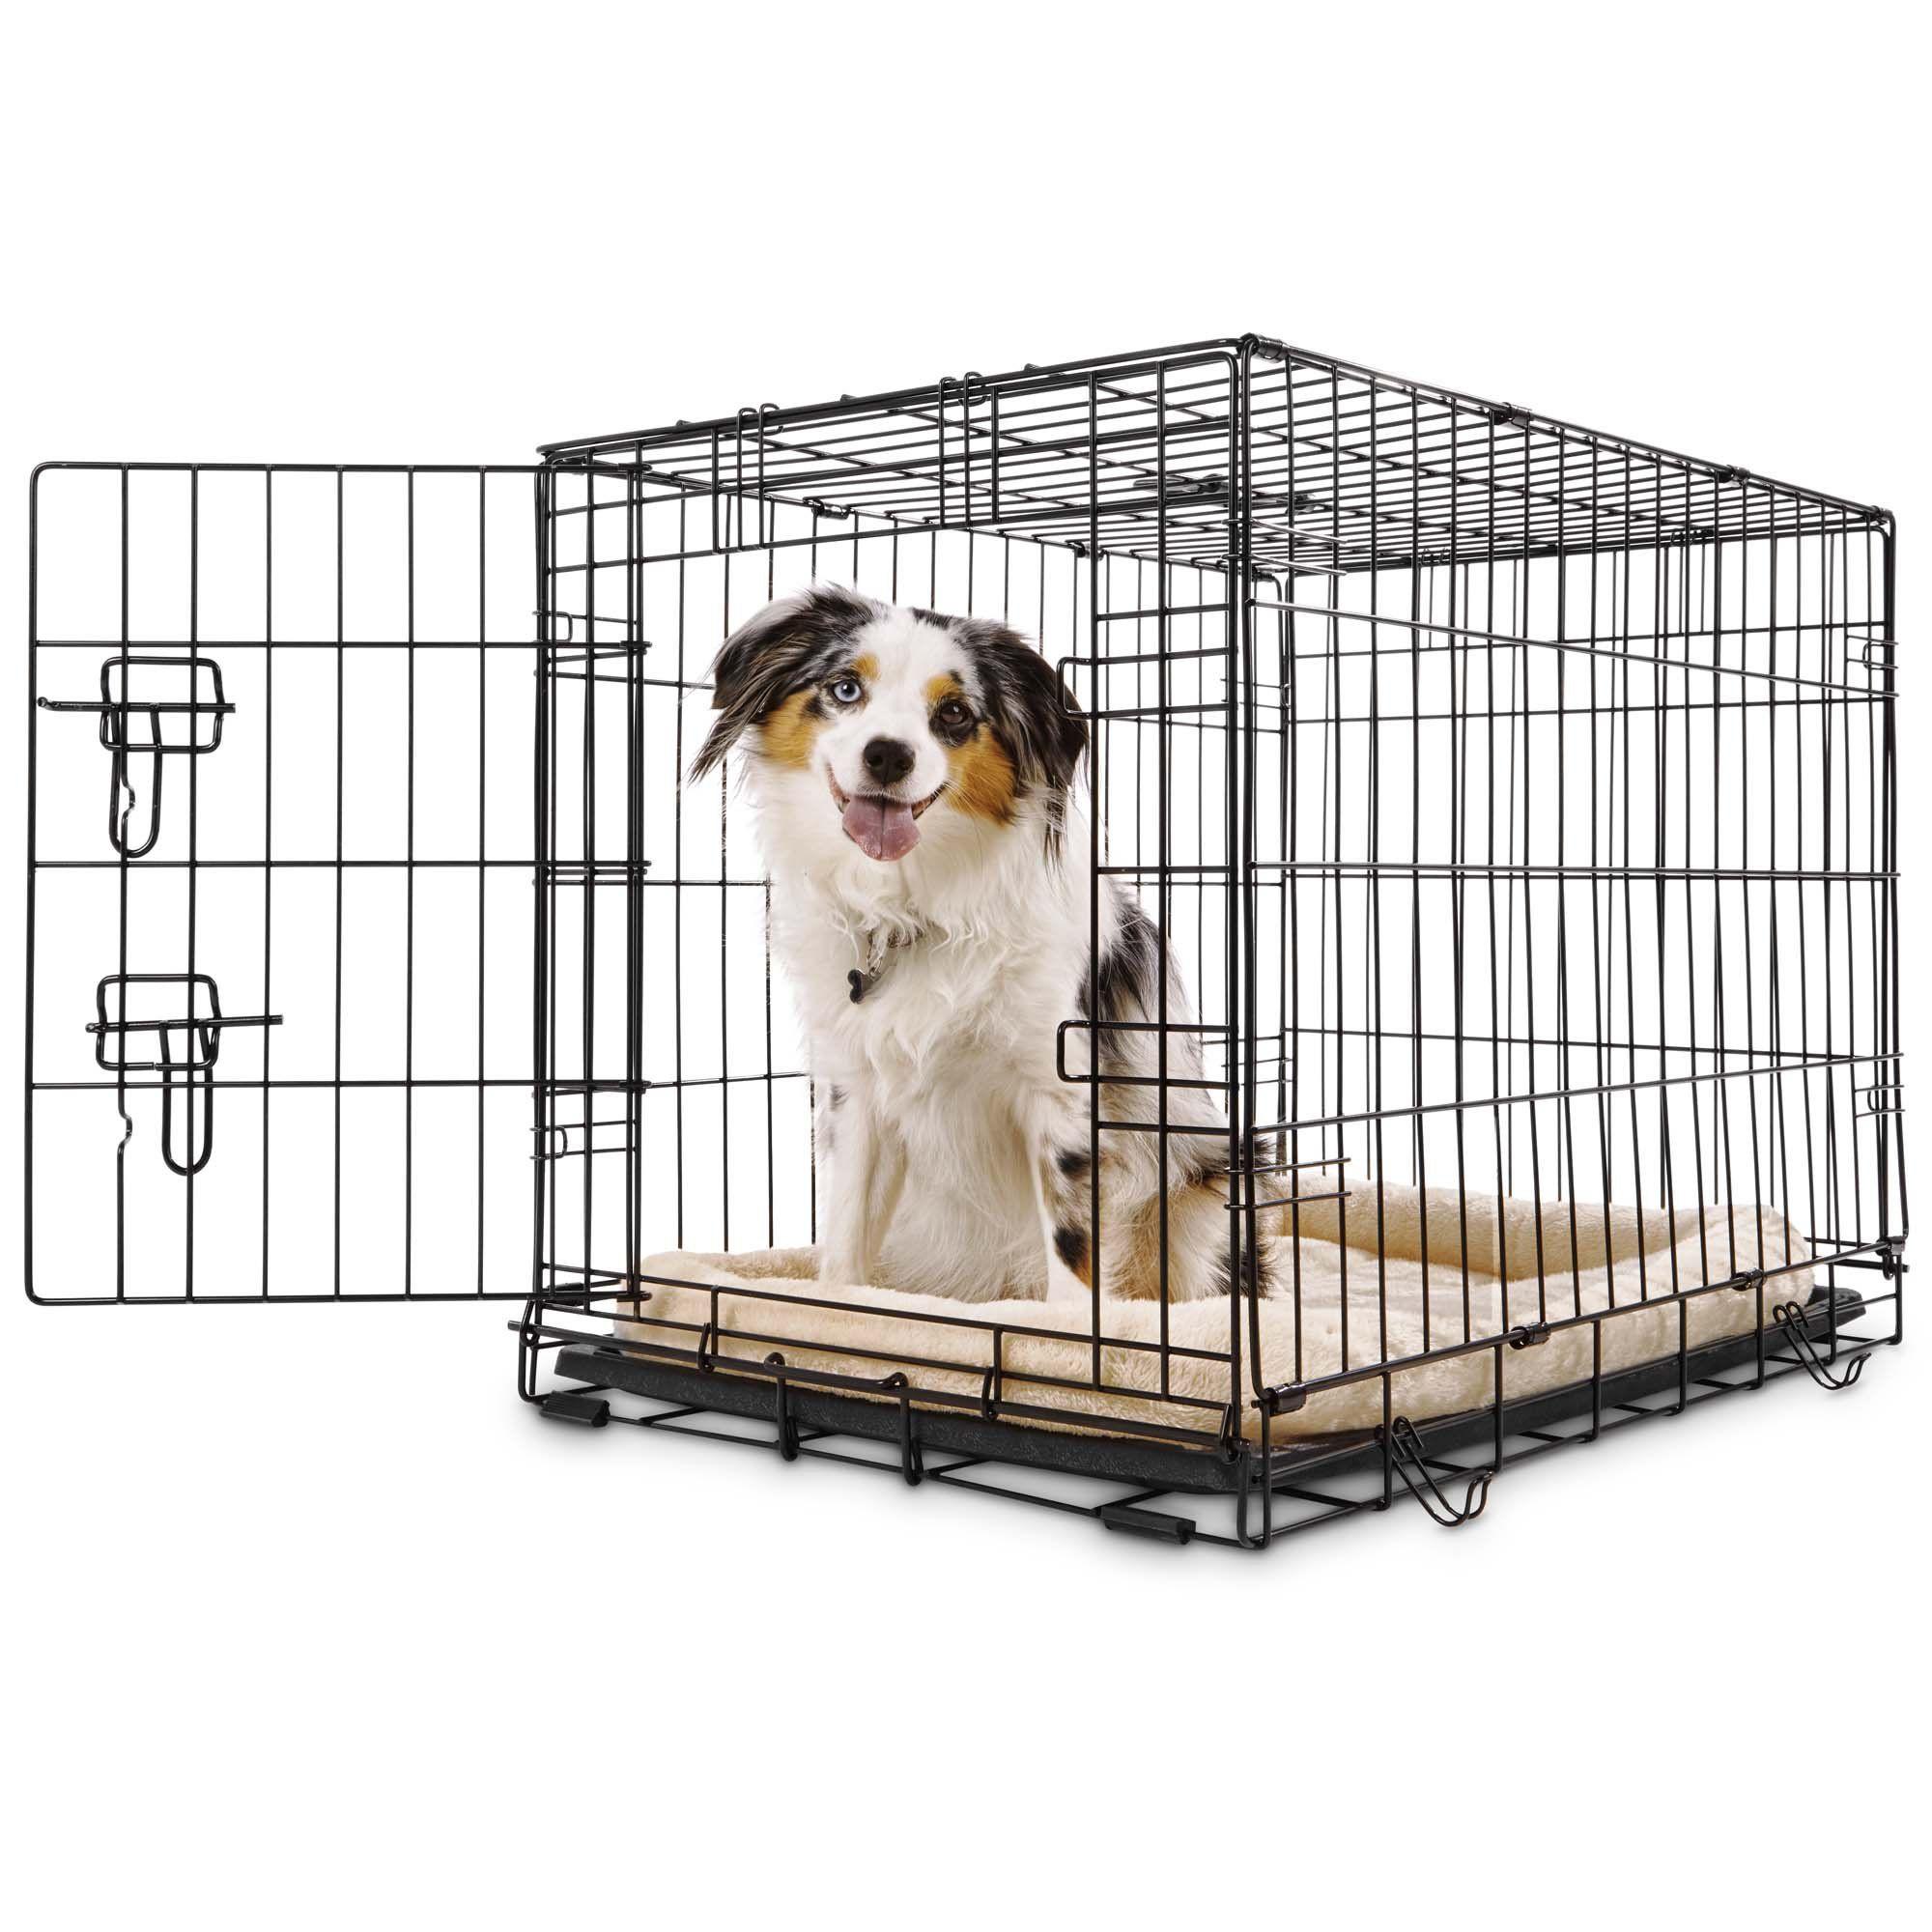 Petco Classic 1 Door Dog Crate 30 L X 19 W X 21 H Medium Large Dog Crate Dog Crate Puppy Safe